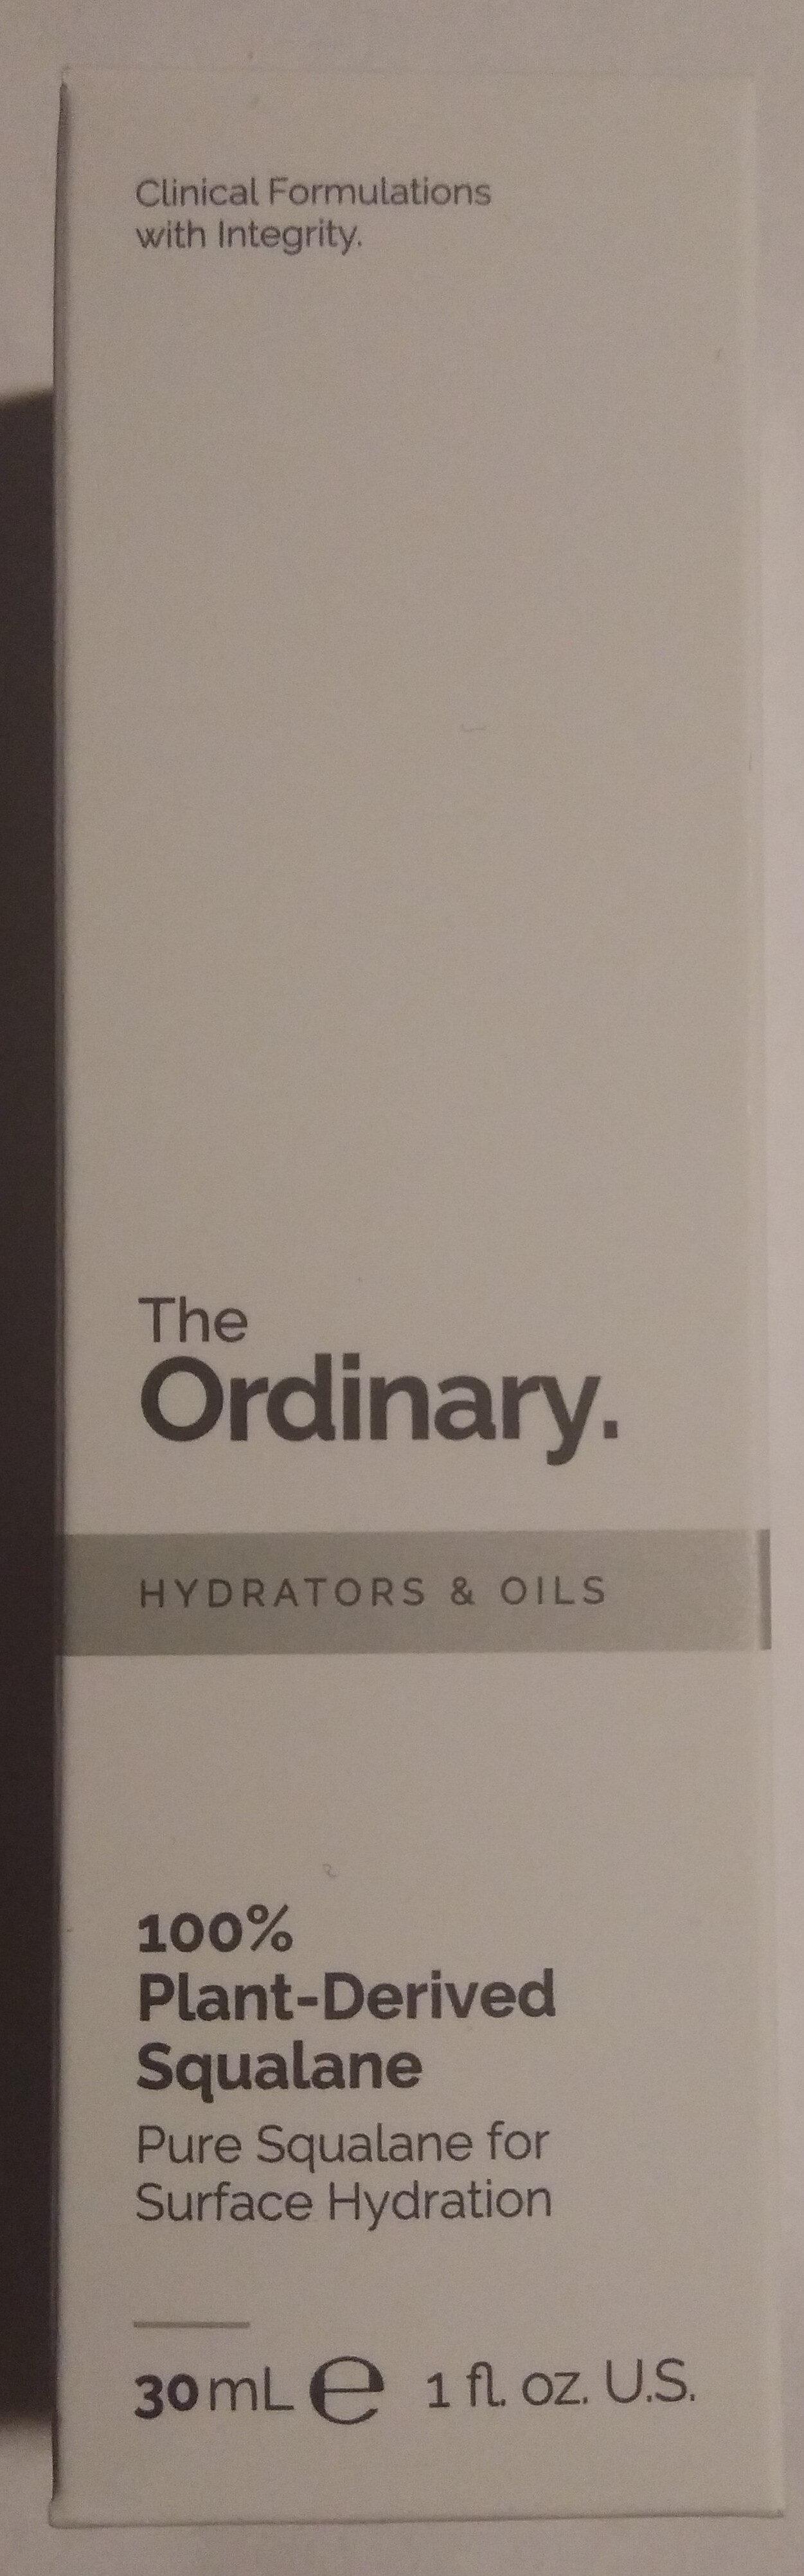 100% Plant-Derived Squalane - Product - en